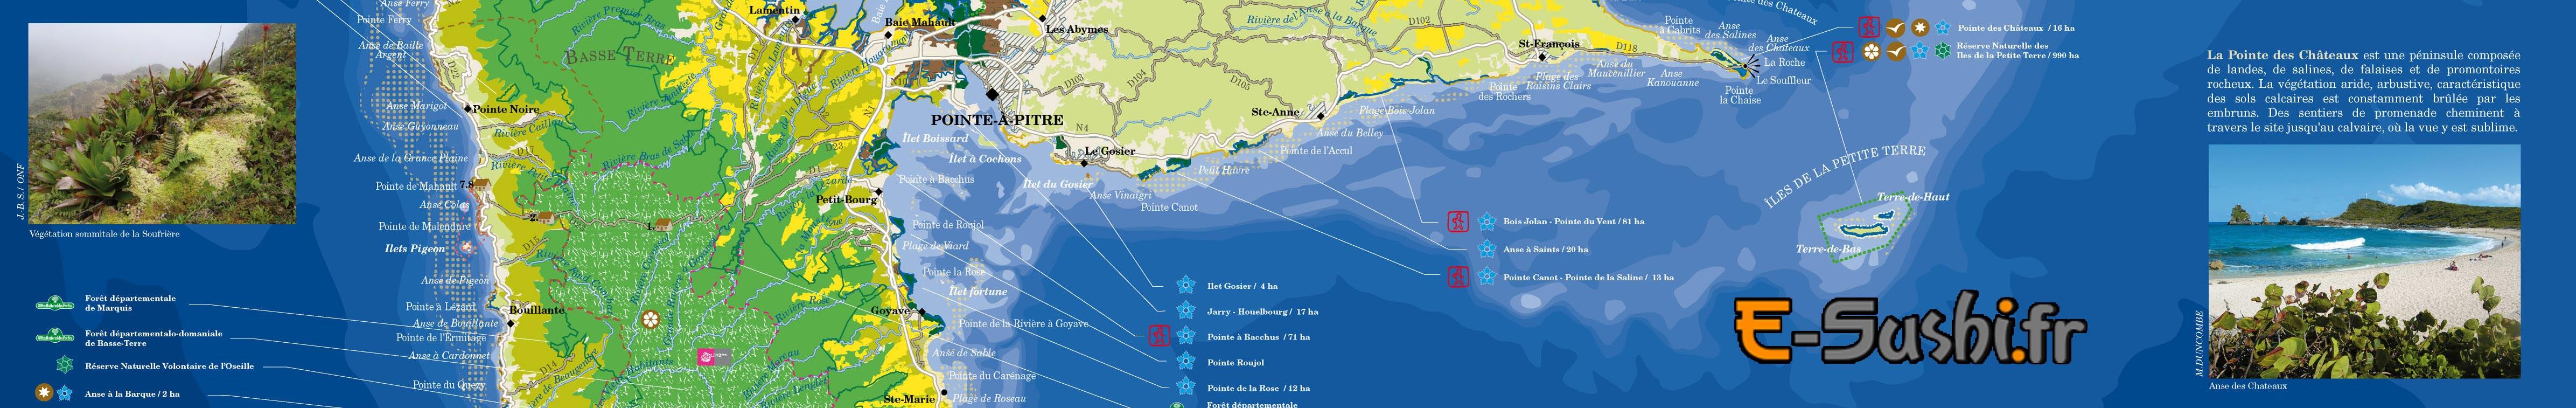 Carte touristique de Guadeloupe Sud